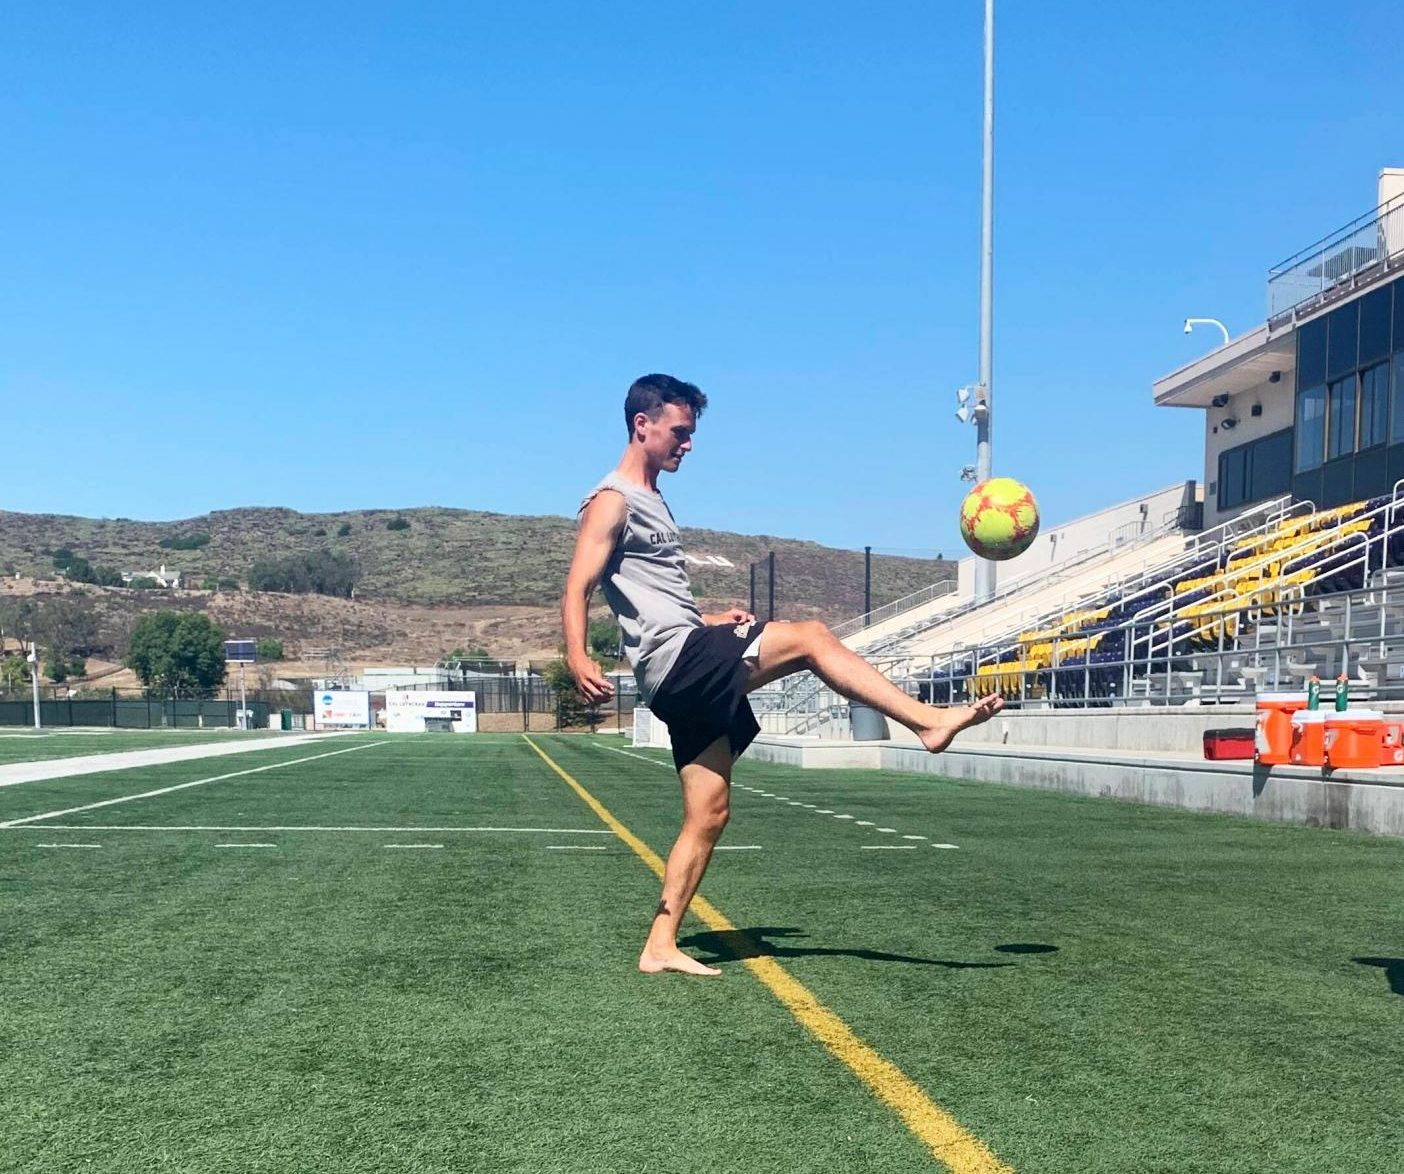 Sophomore Cameron Korshavn practices for the next varsity soccer game at the University of La Verne on Oct. 9.